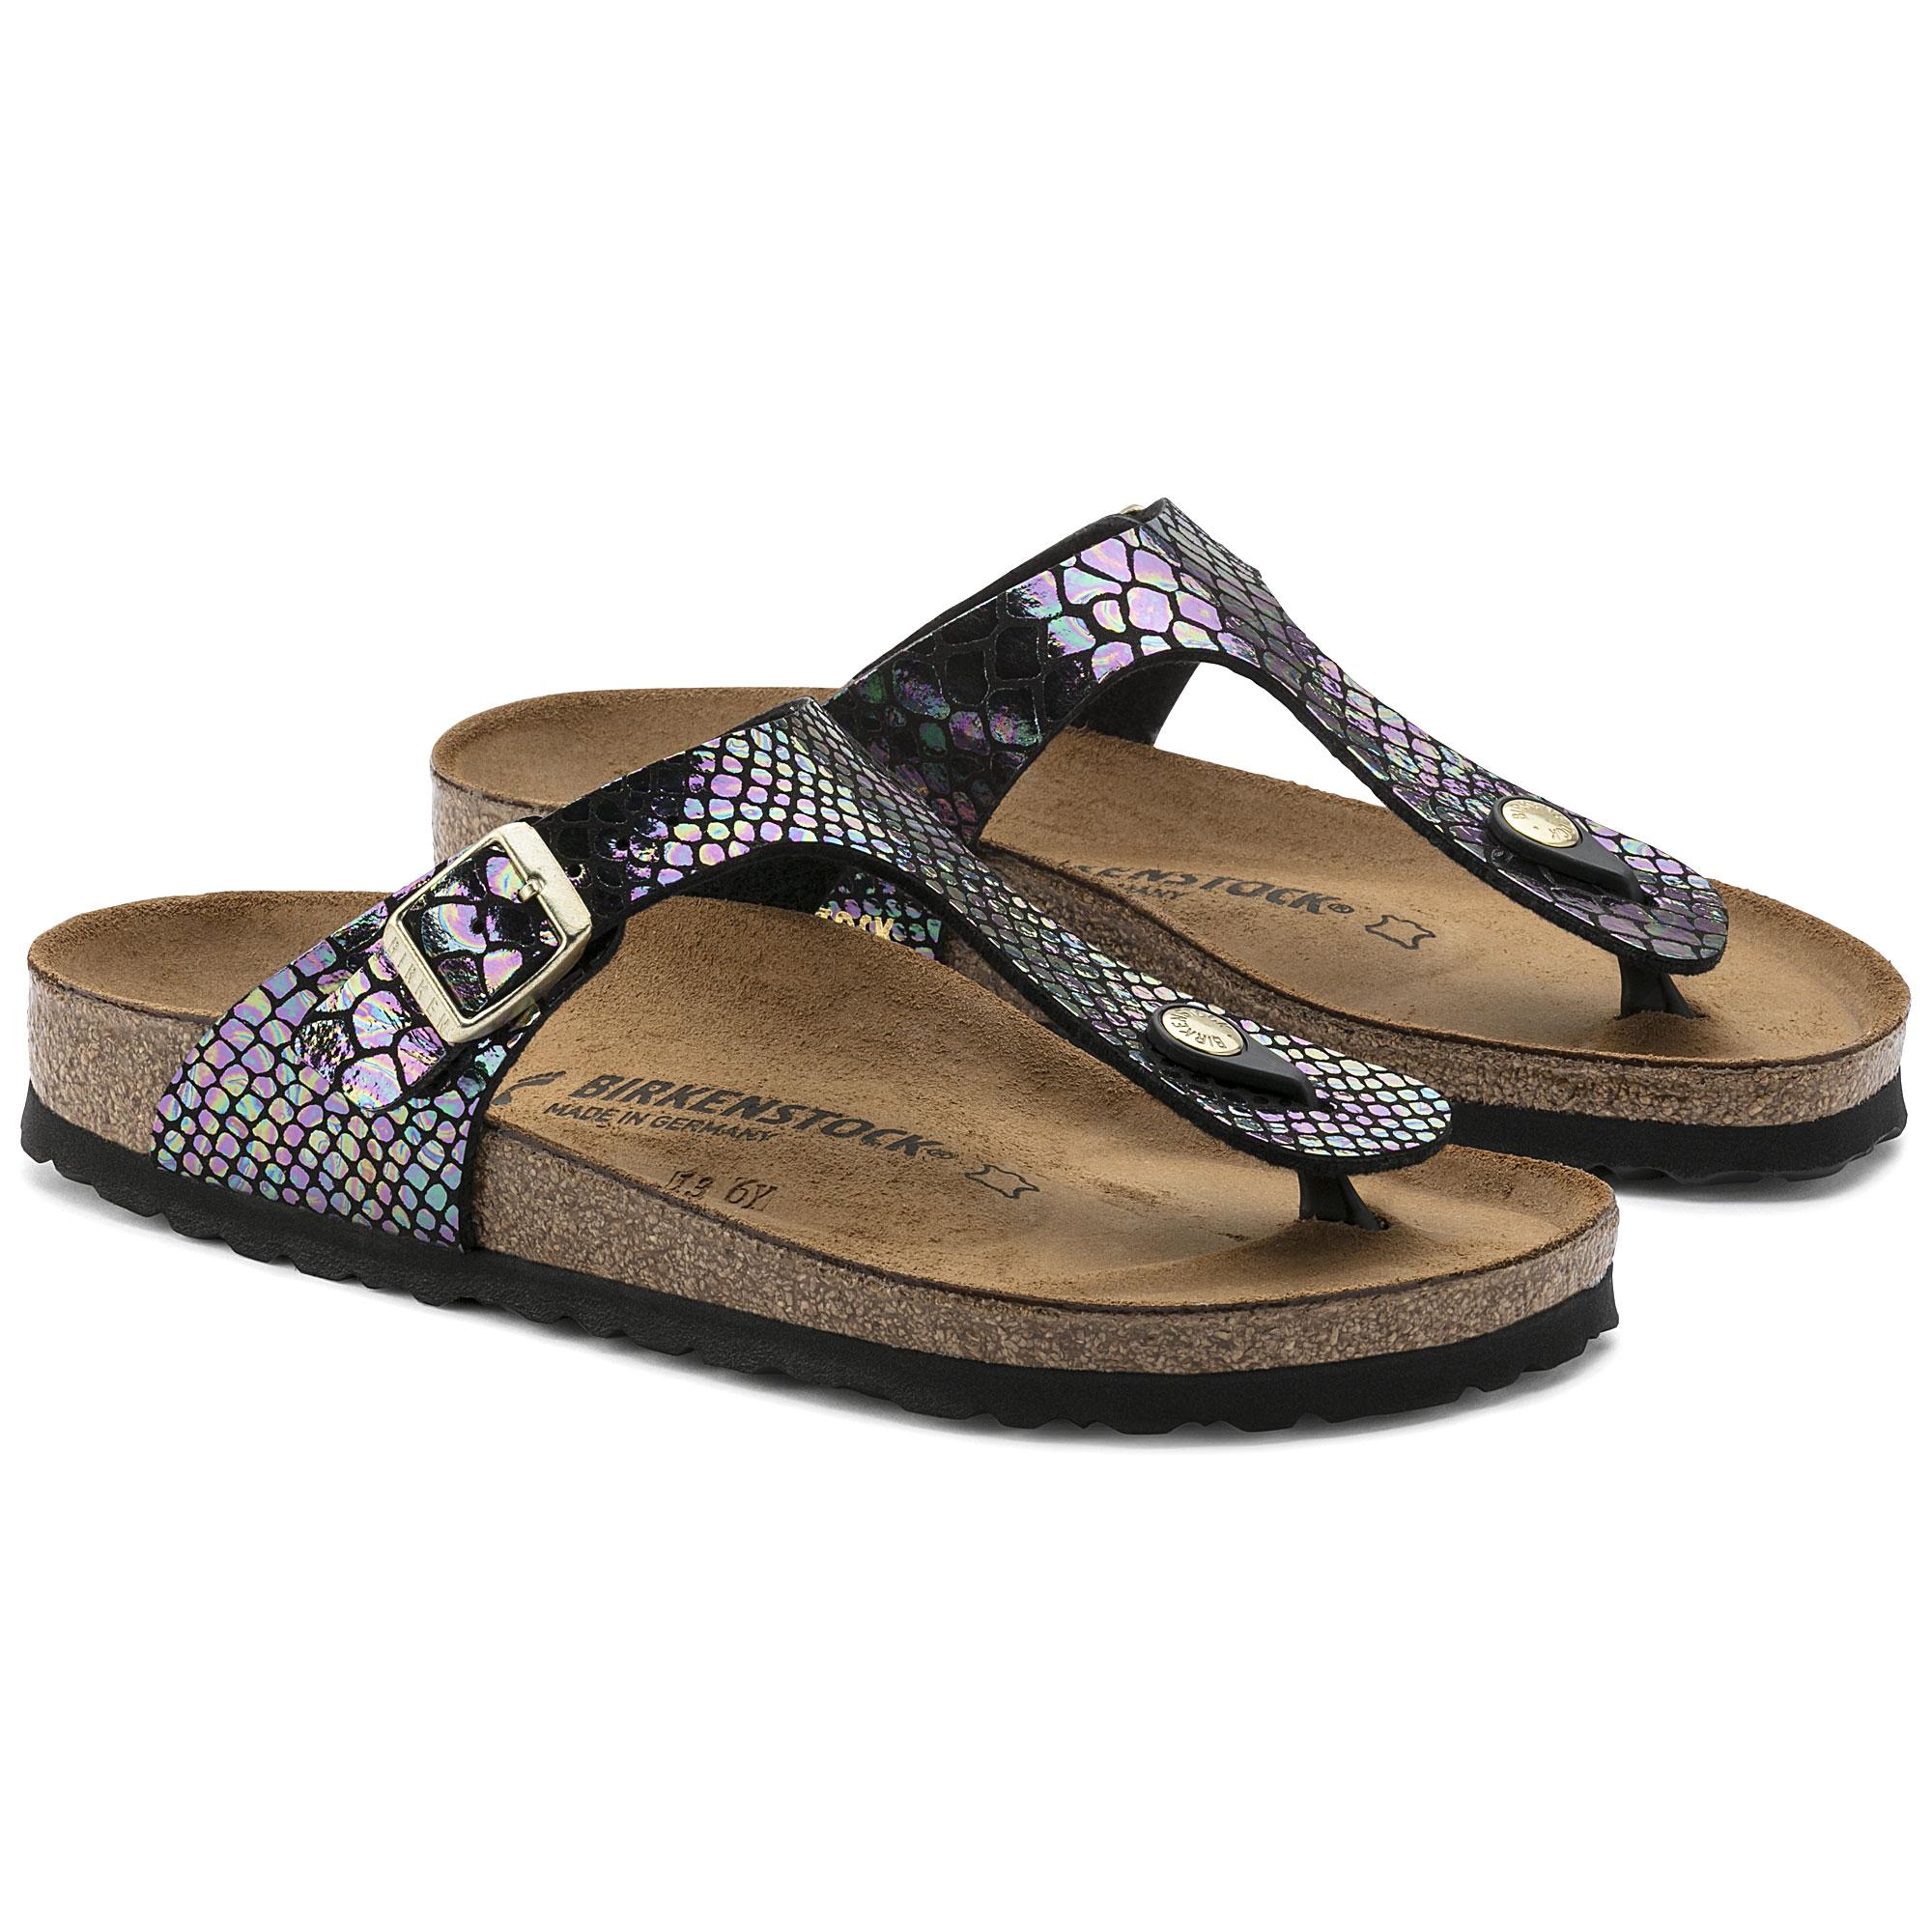 4FD912LWME Womens Gizeh Shiny Snake Black Multicolor Birko-Flor Sandals 37 EU Tienda En Línea Barato Real Descuento Fotos DU4i3qxLd